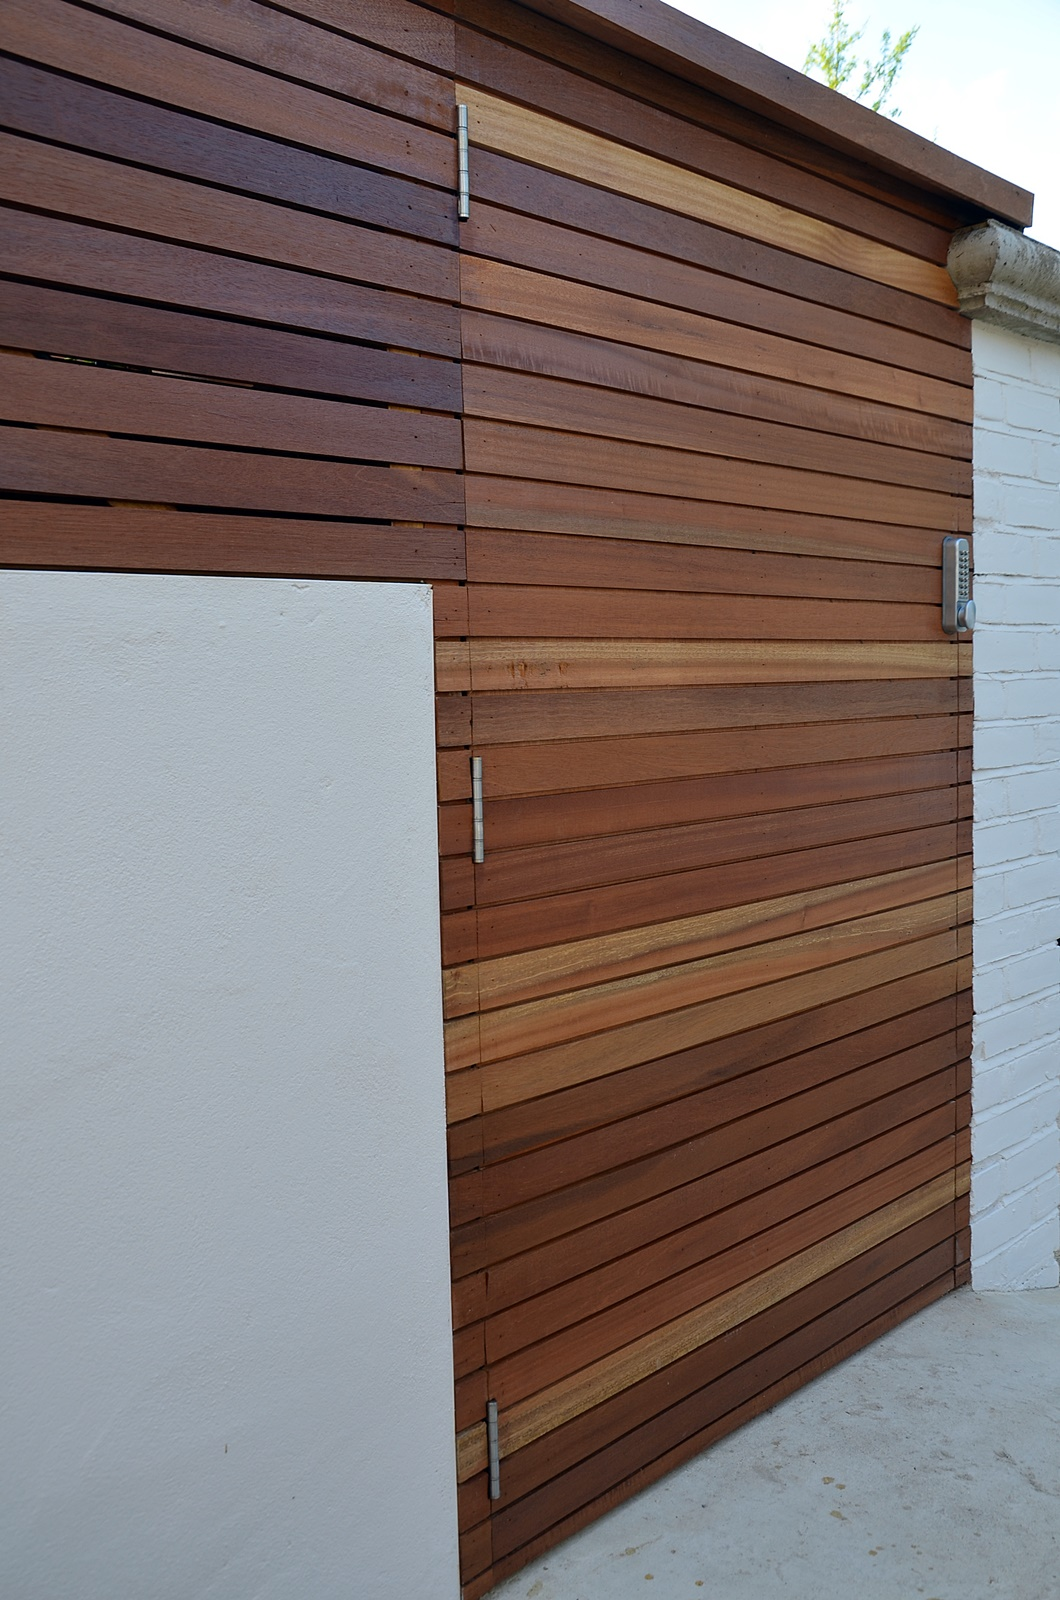 bespoke hardwood storage wimbledon putney wandsworth london